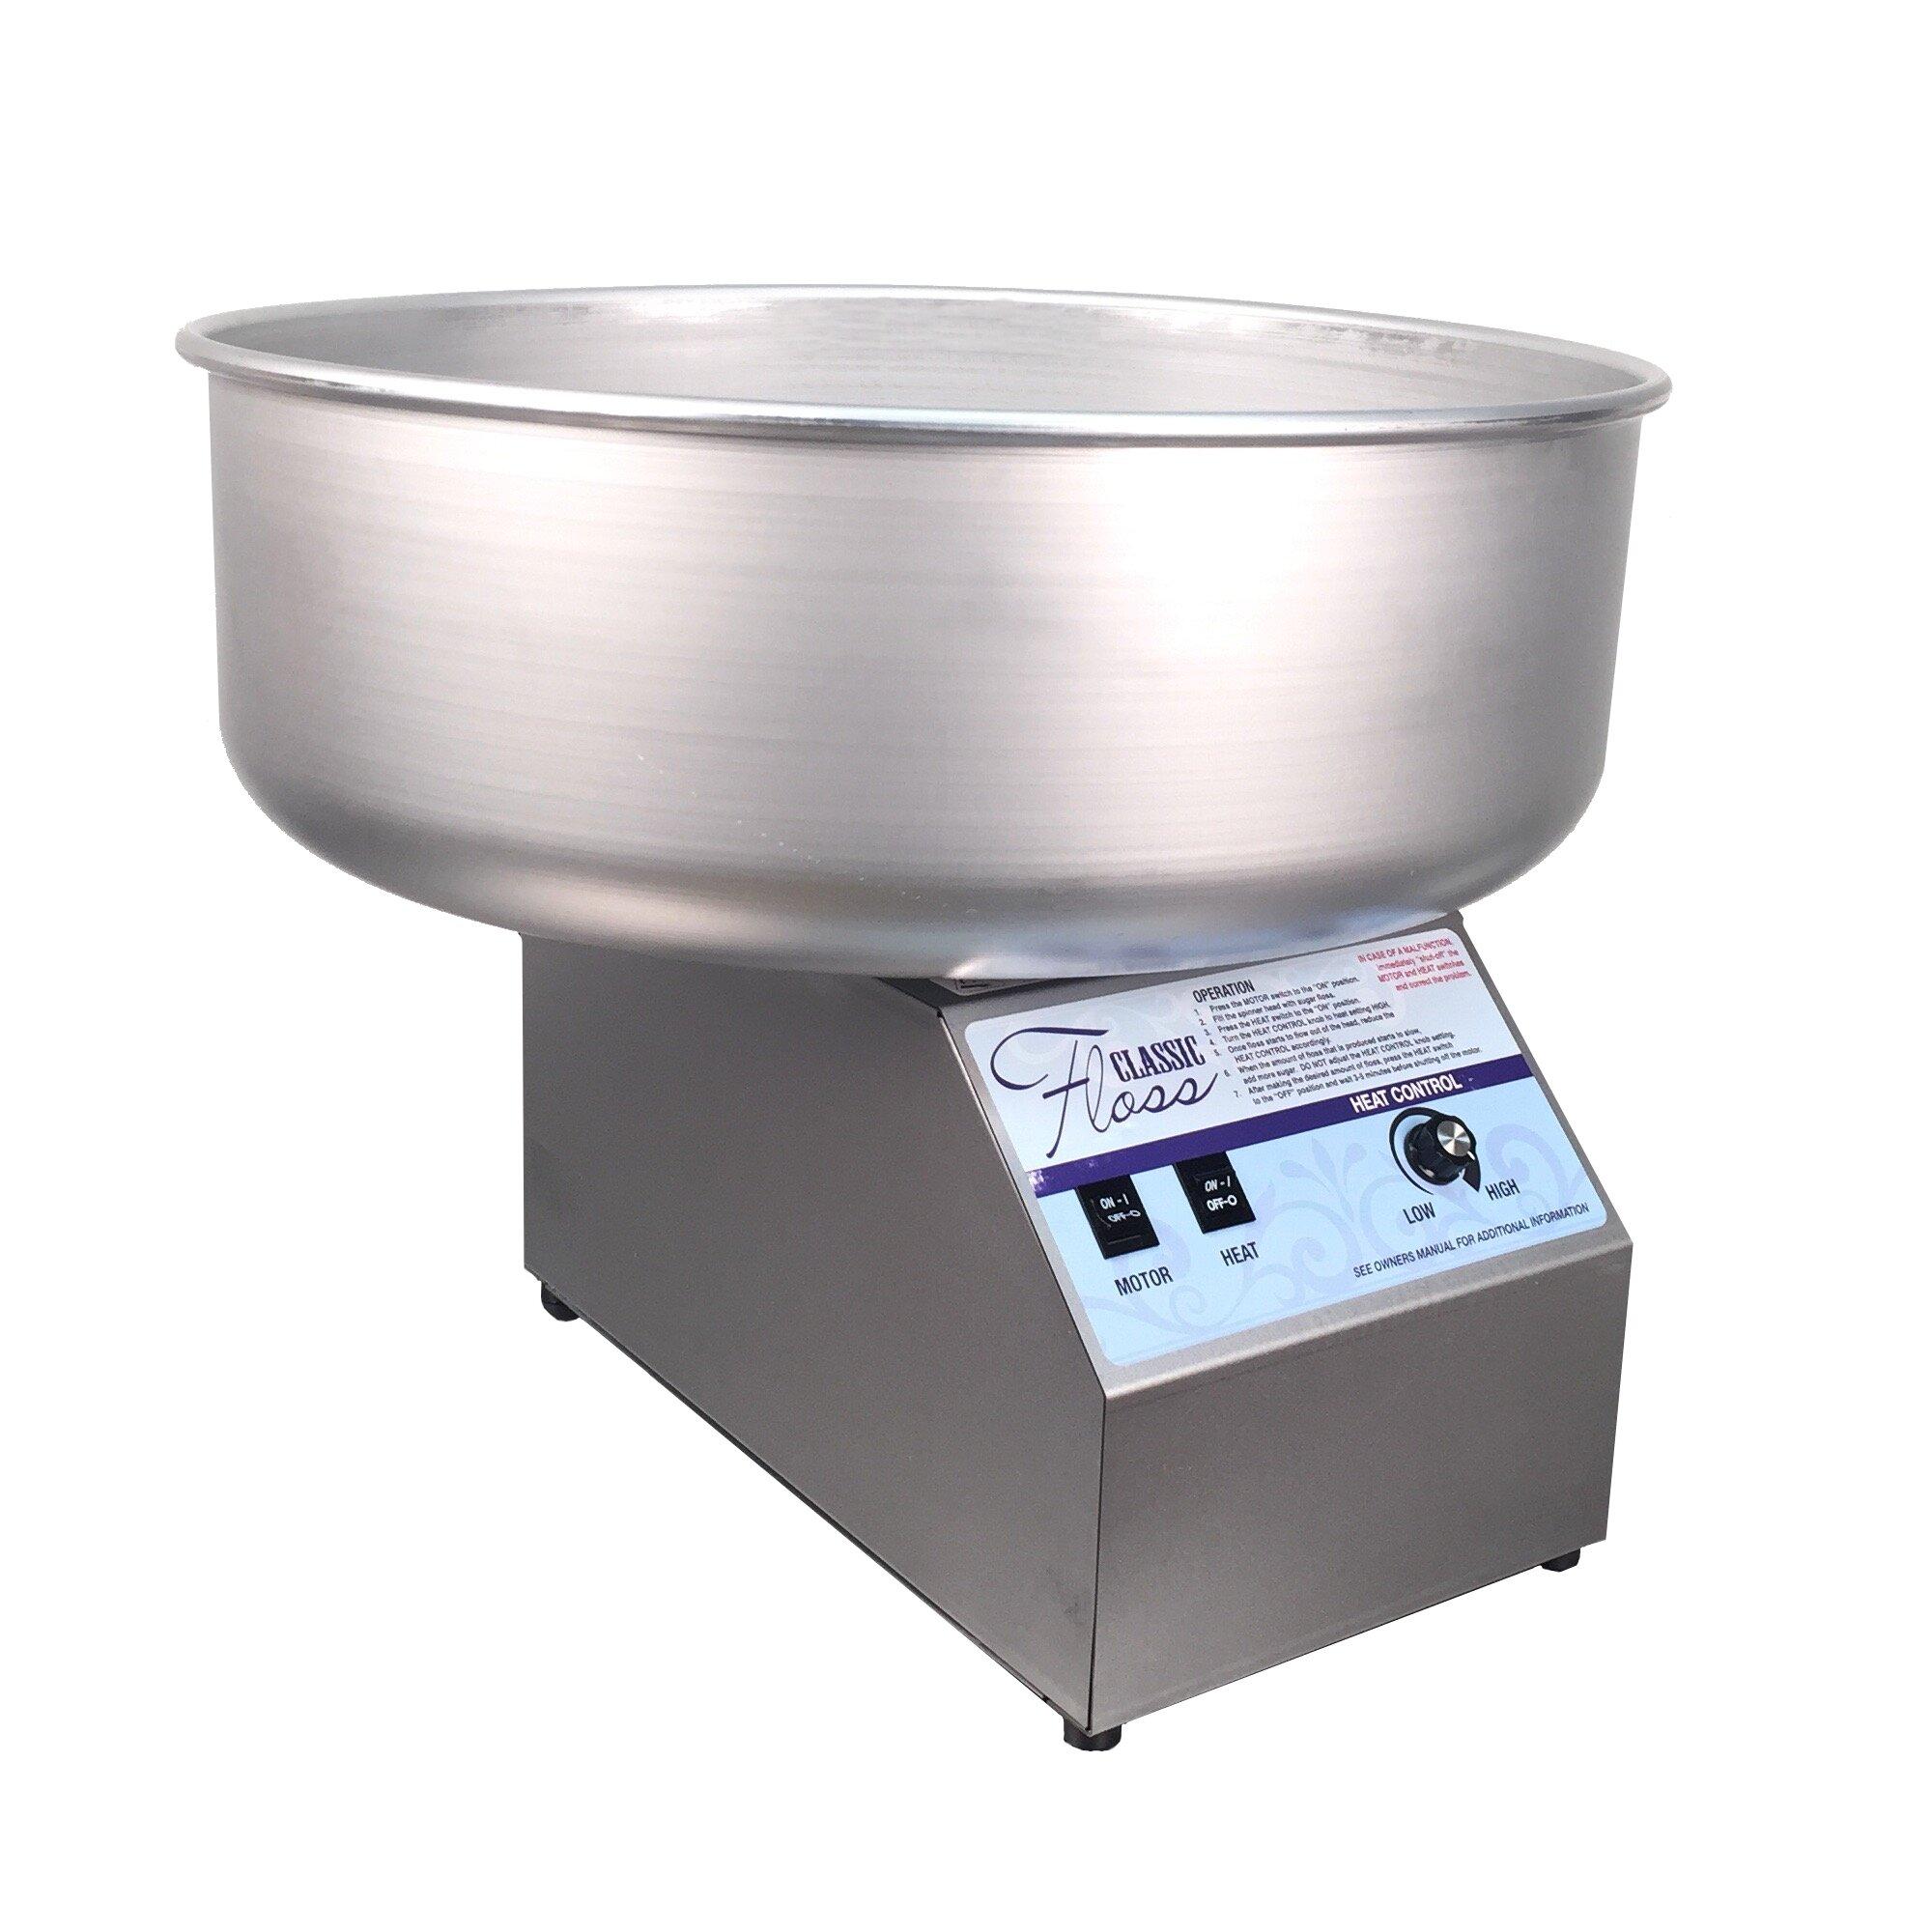 paragon cotton candy machine reviews